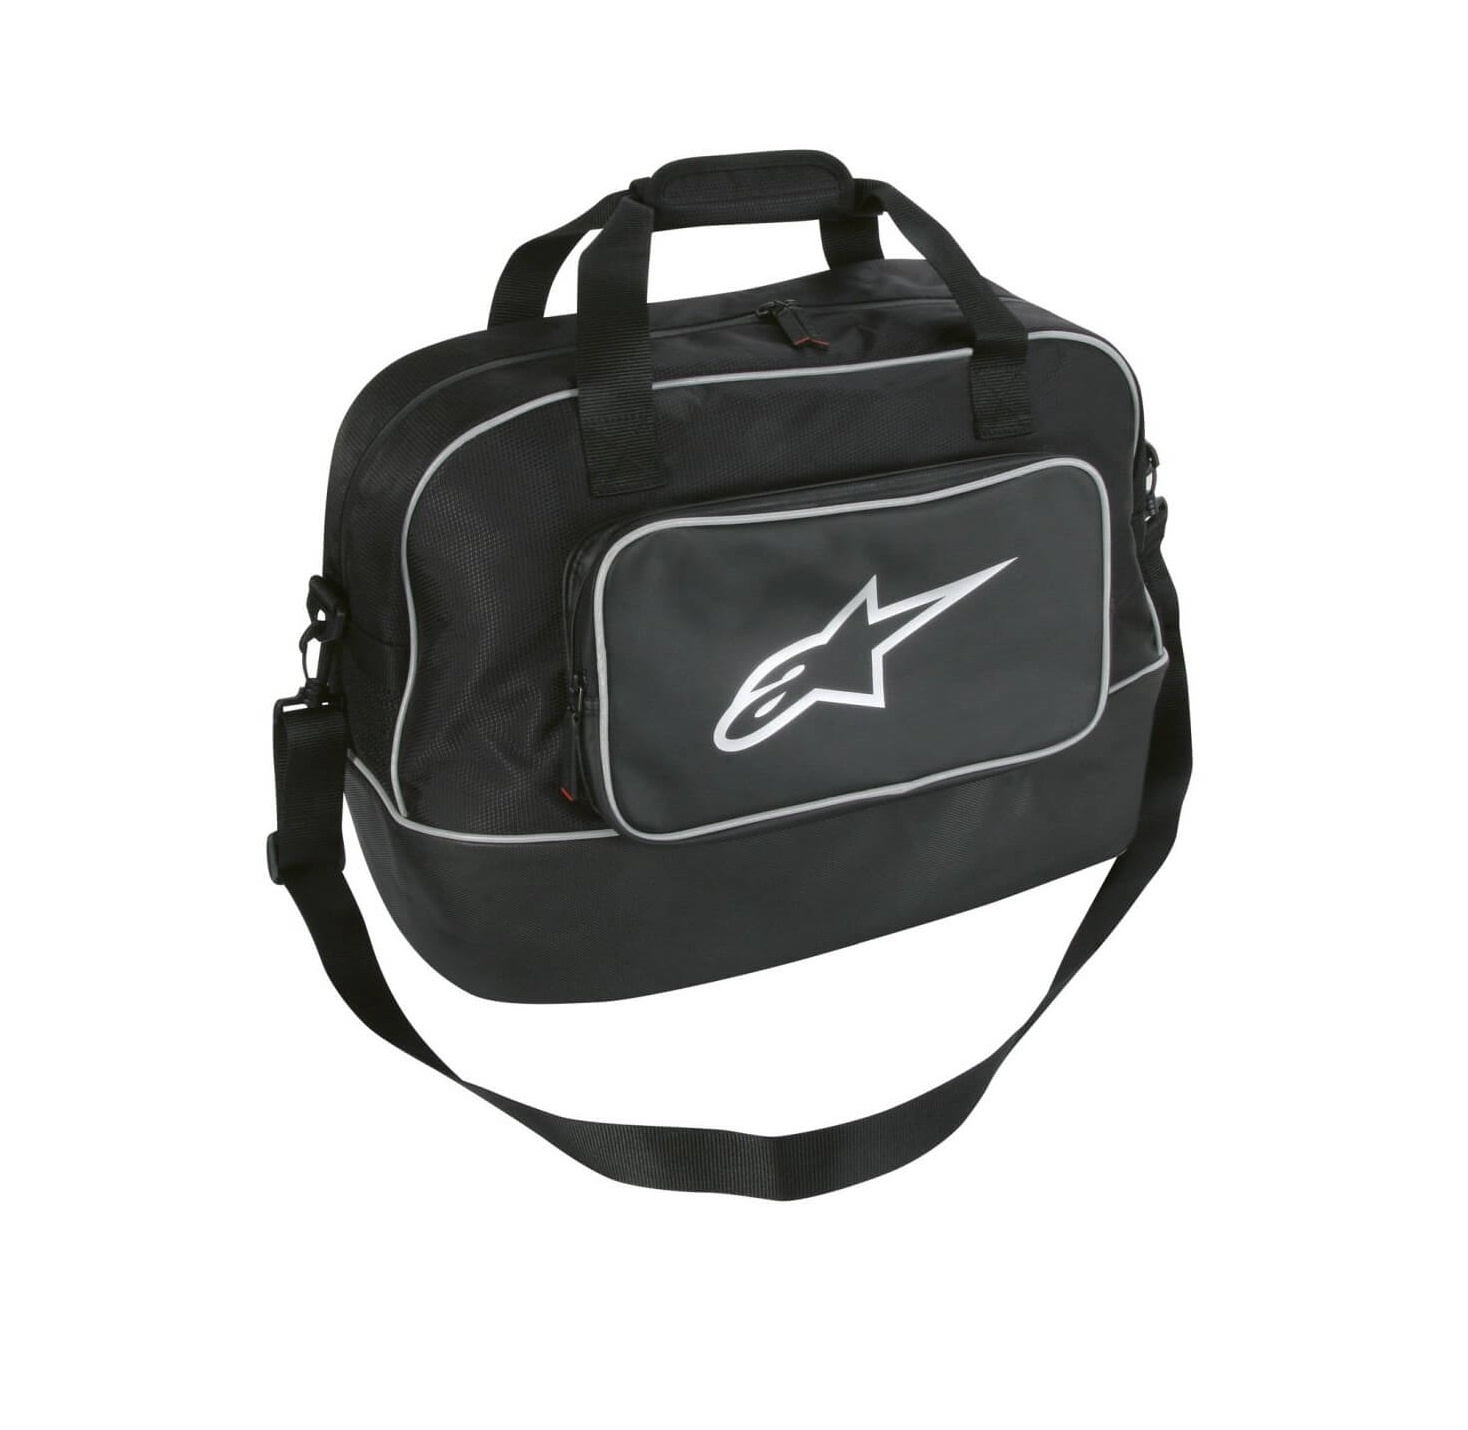 Alpinestars STD Helmet Bag - Black/White